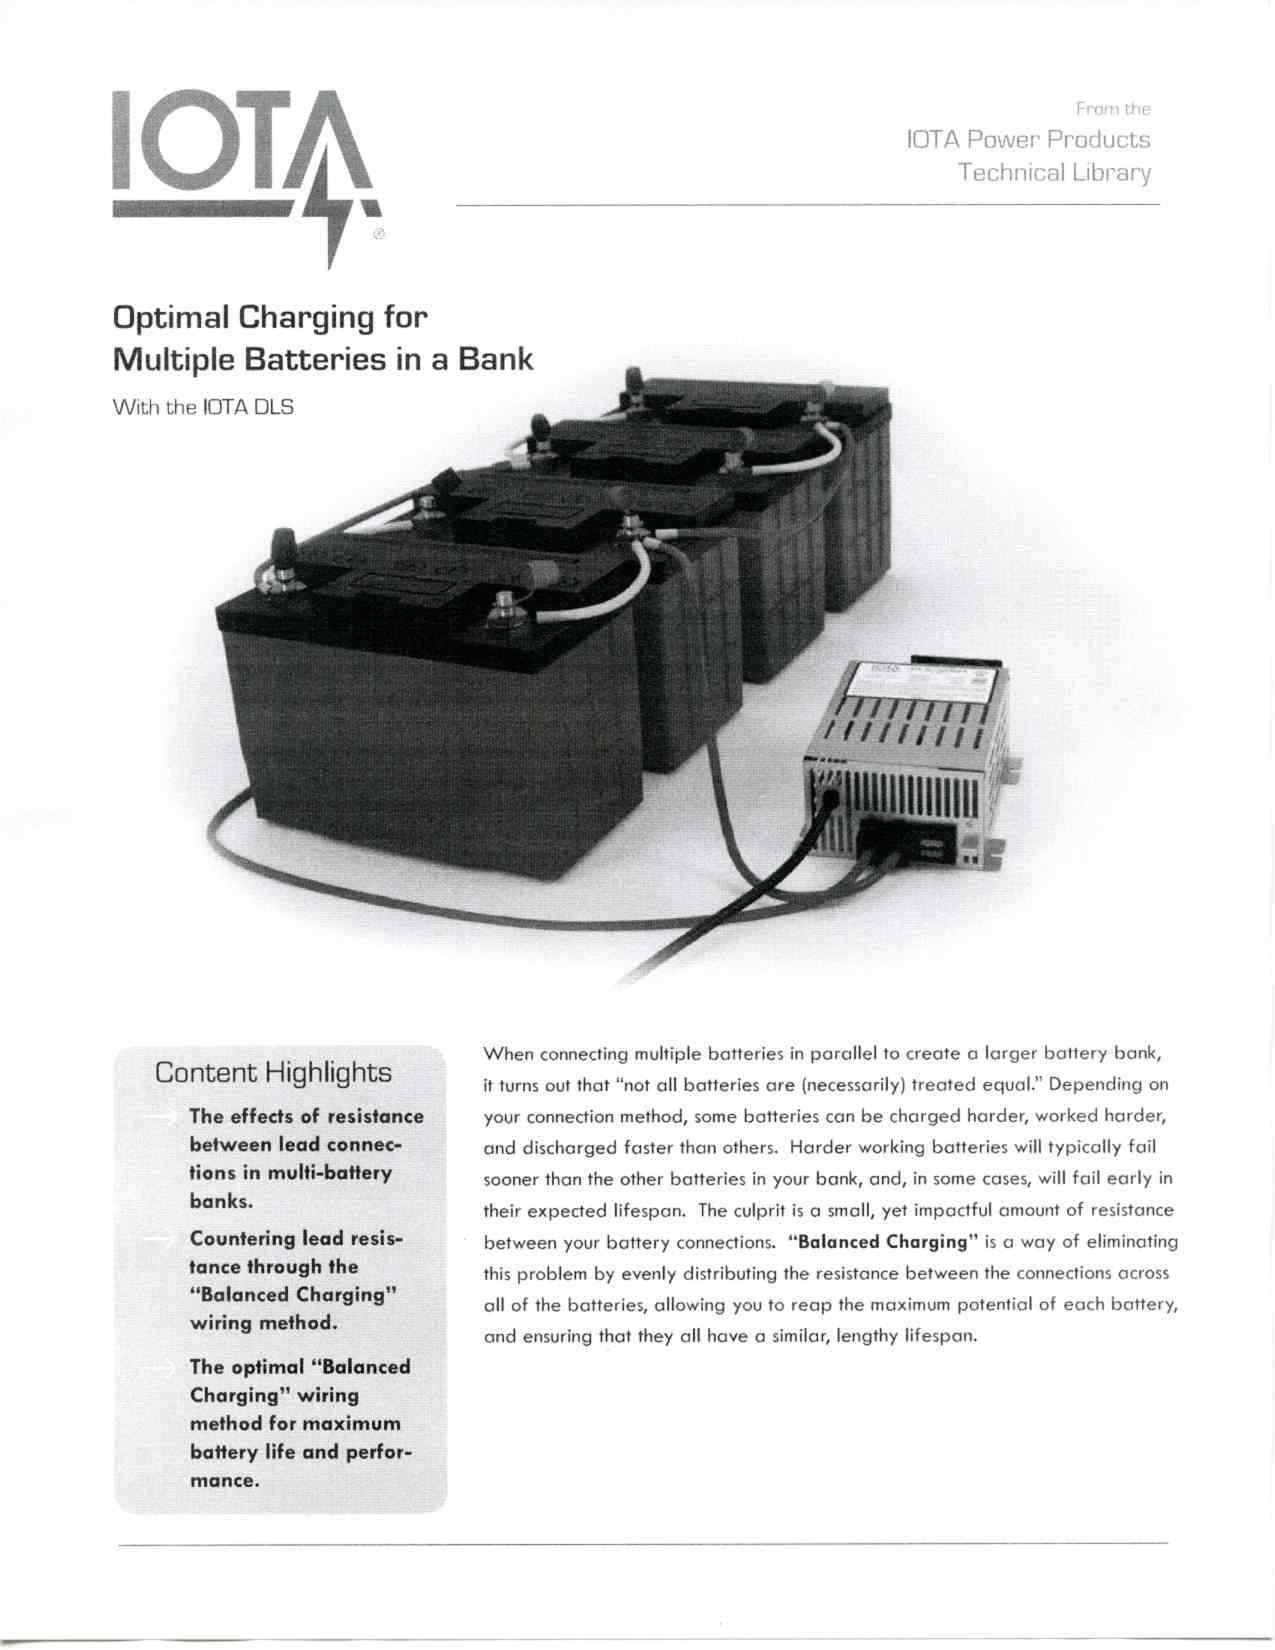 445afb720?resize\\\\\\\=665%2C861 power sentry ps300 wiring diagram power cable diagram, motor power sentry ps300 wiring diagram at soozxer.org